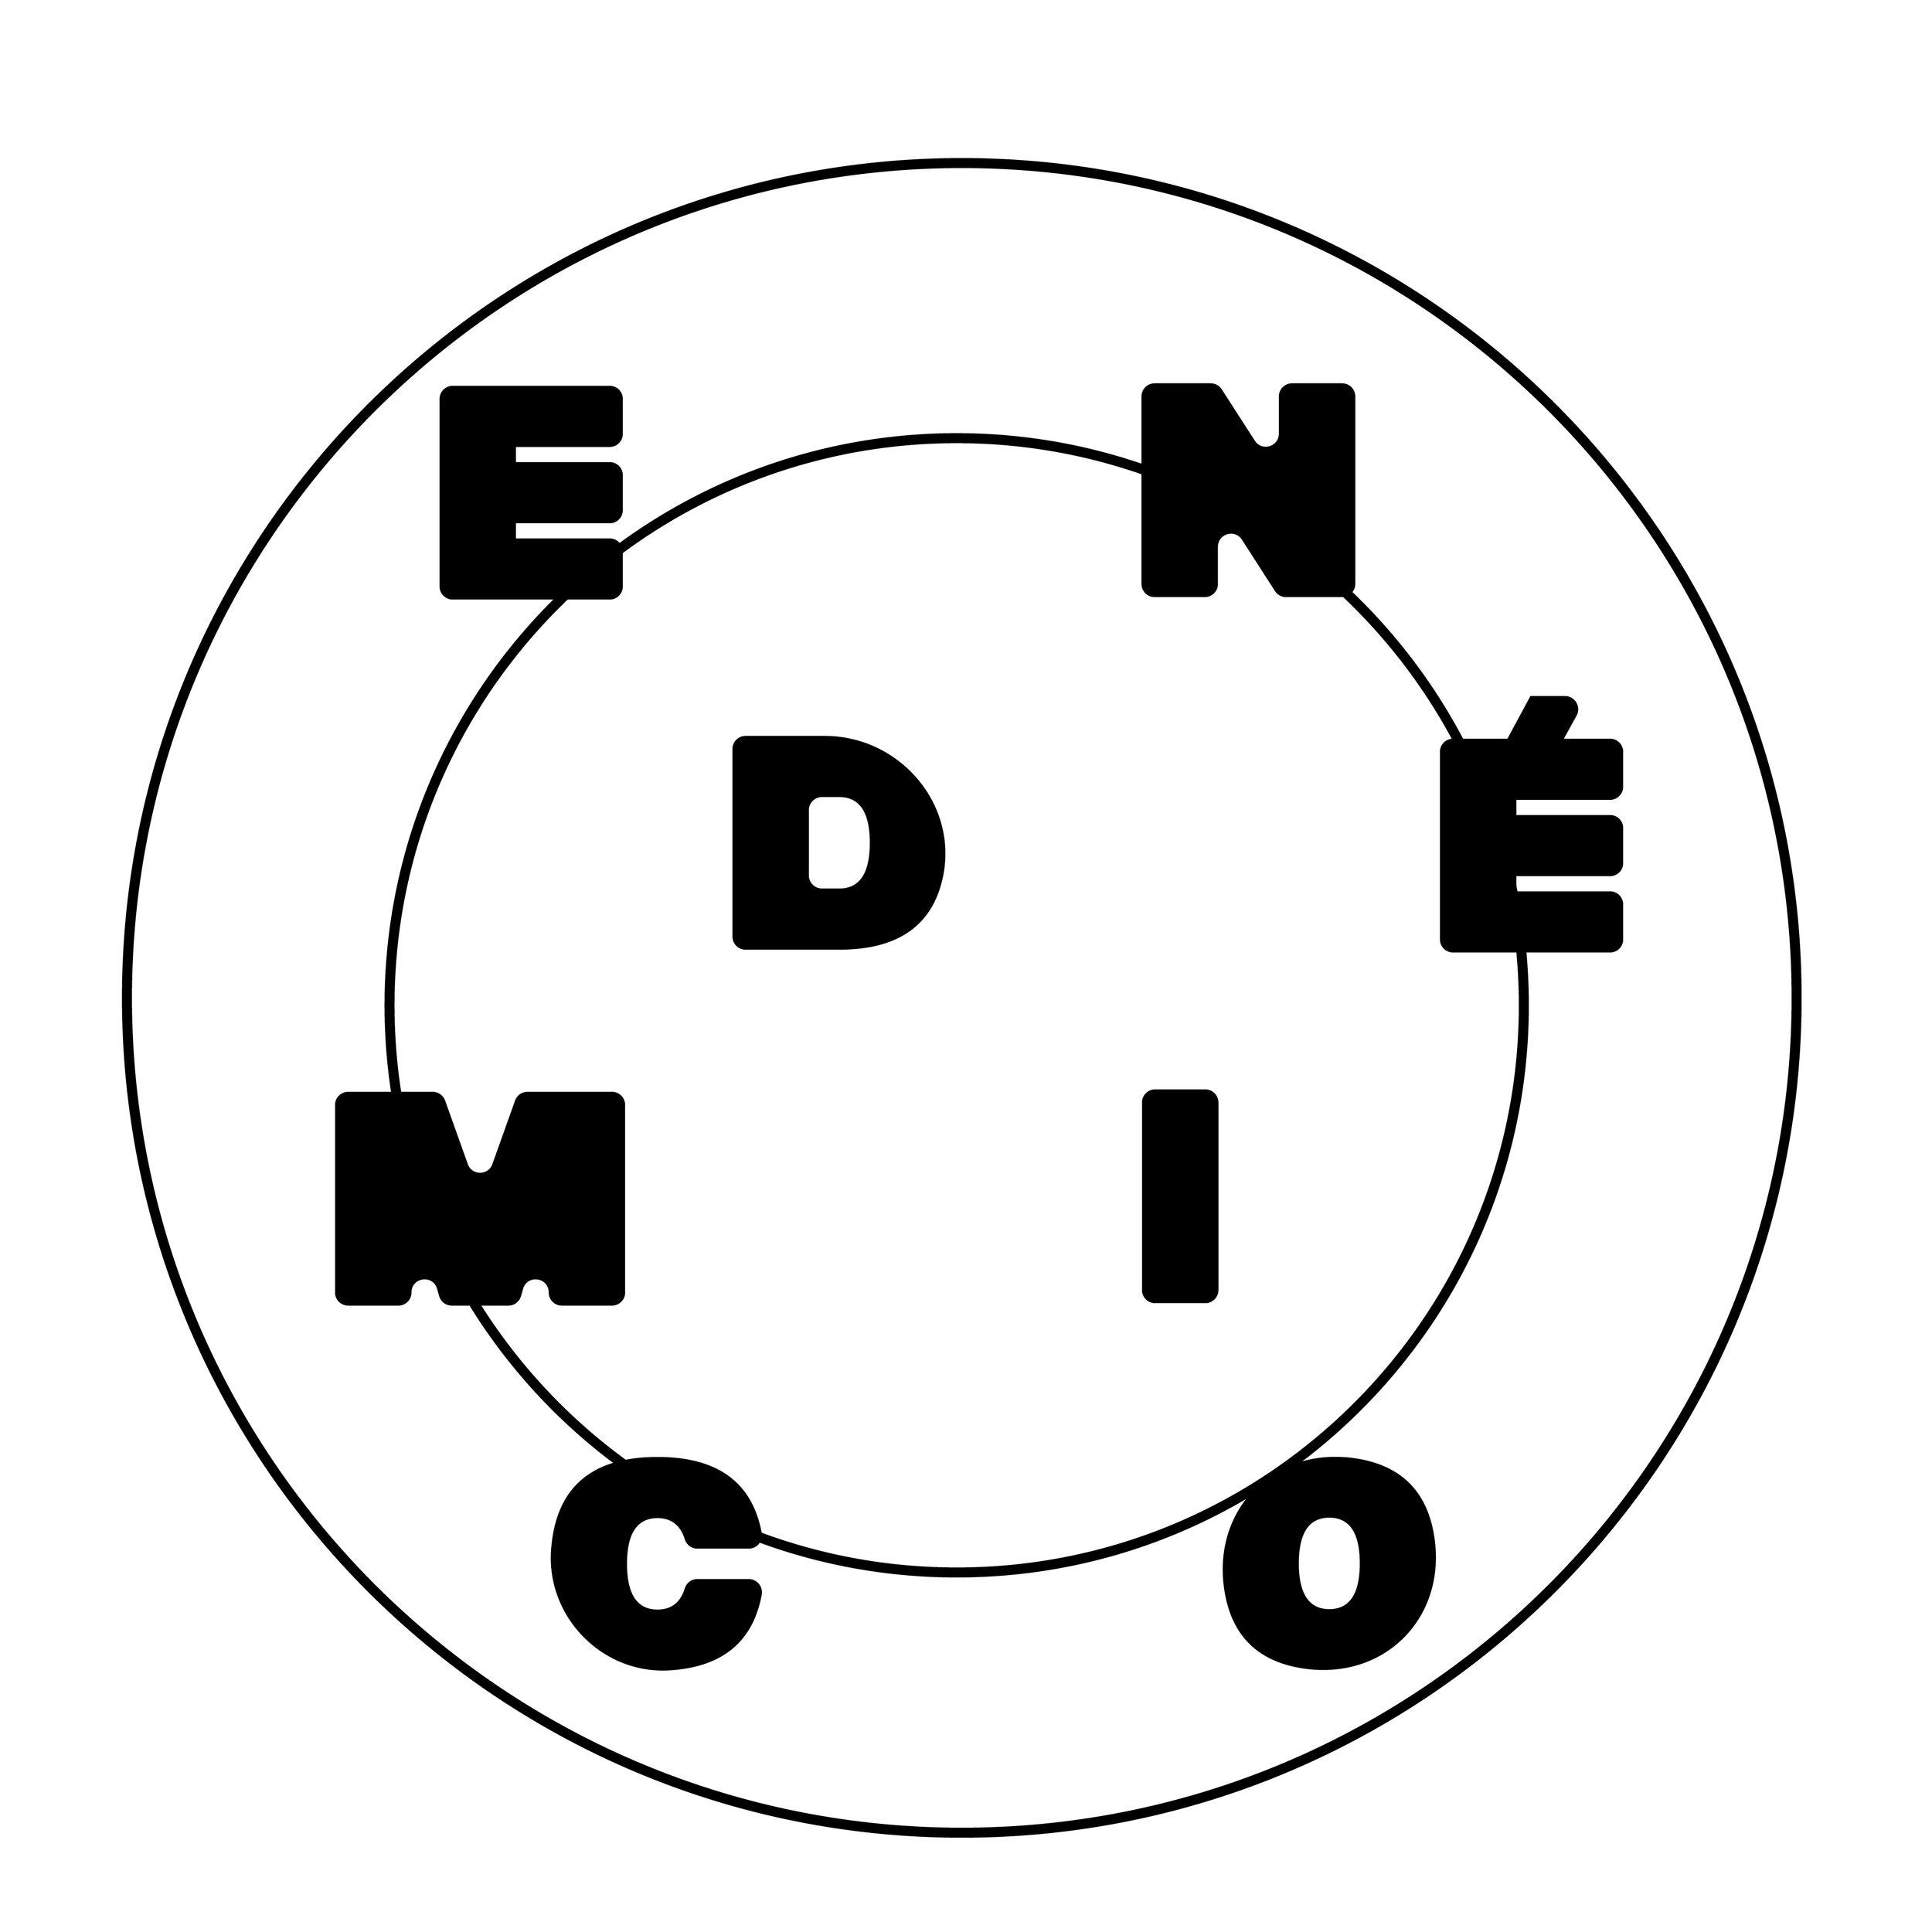 ENDEMICO_LOGOFINAL-03.jpg